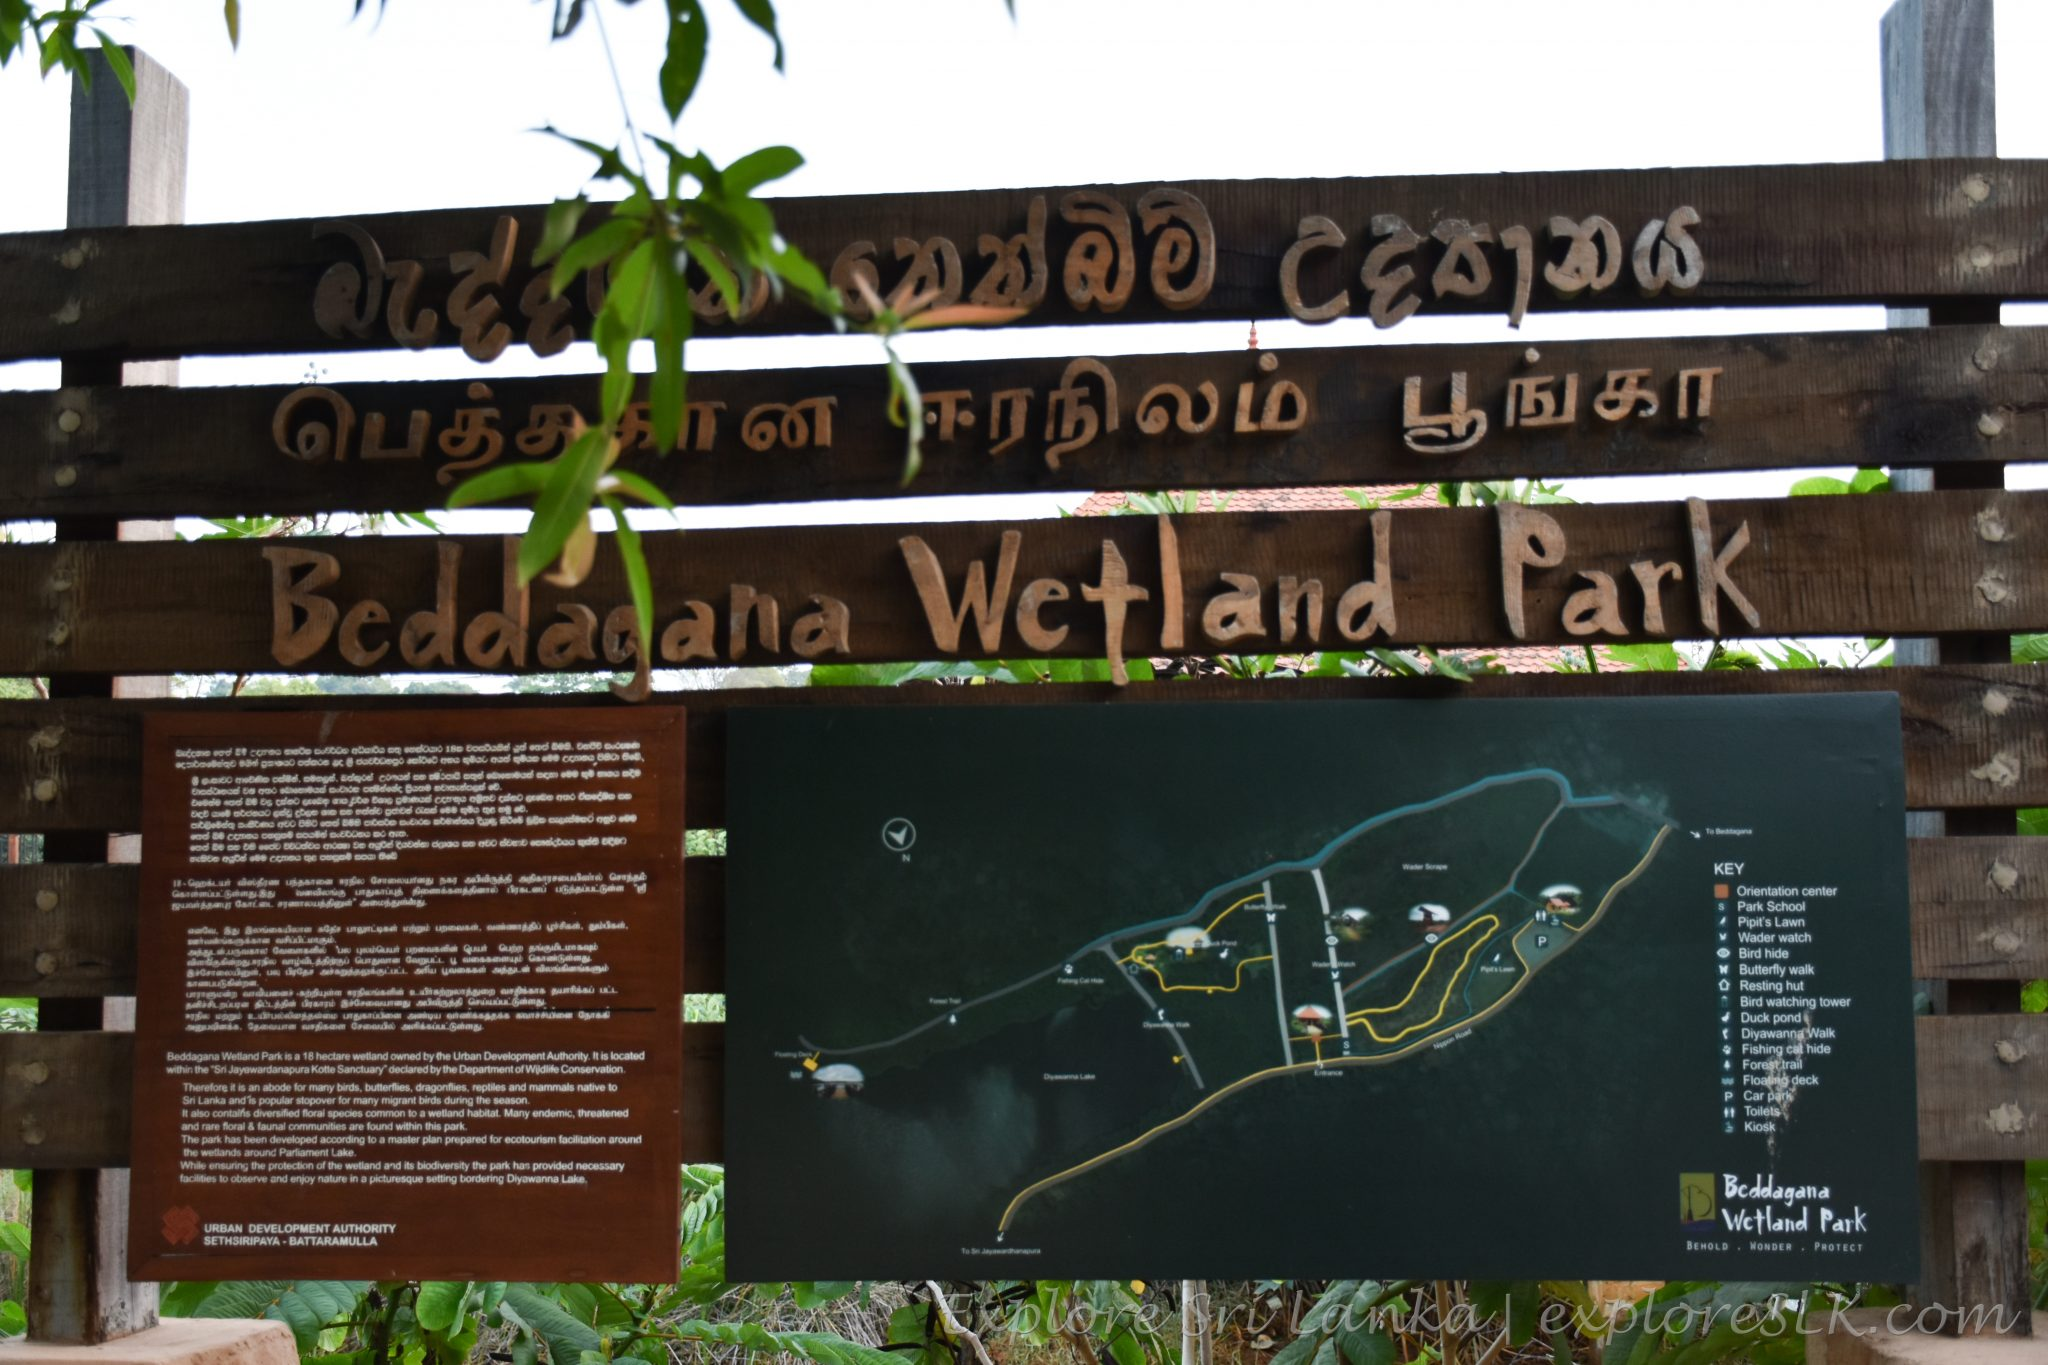 beddagana wetland park entrance